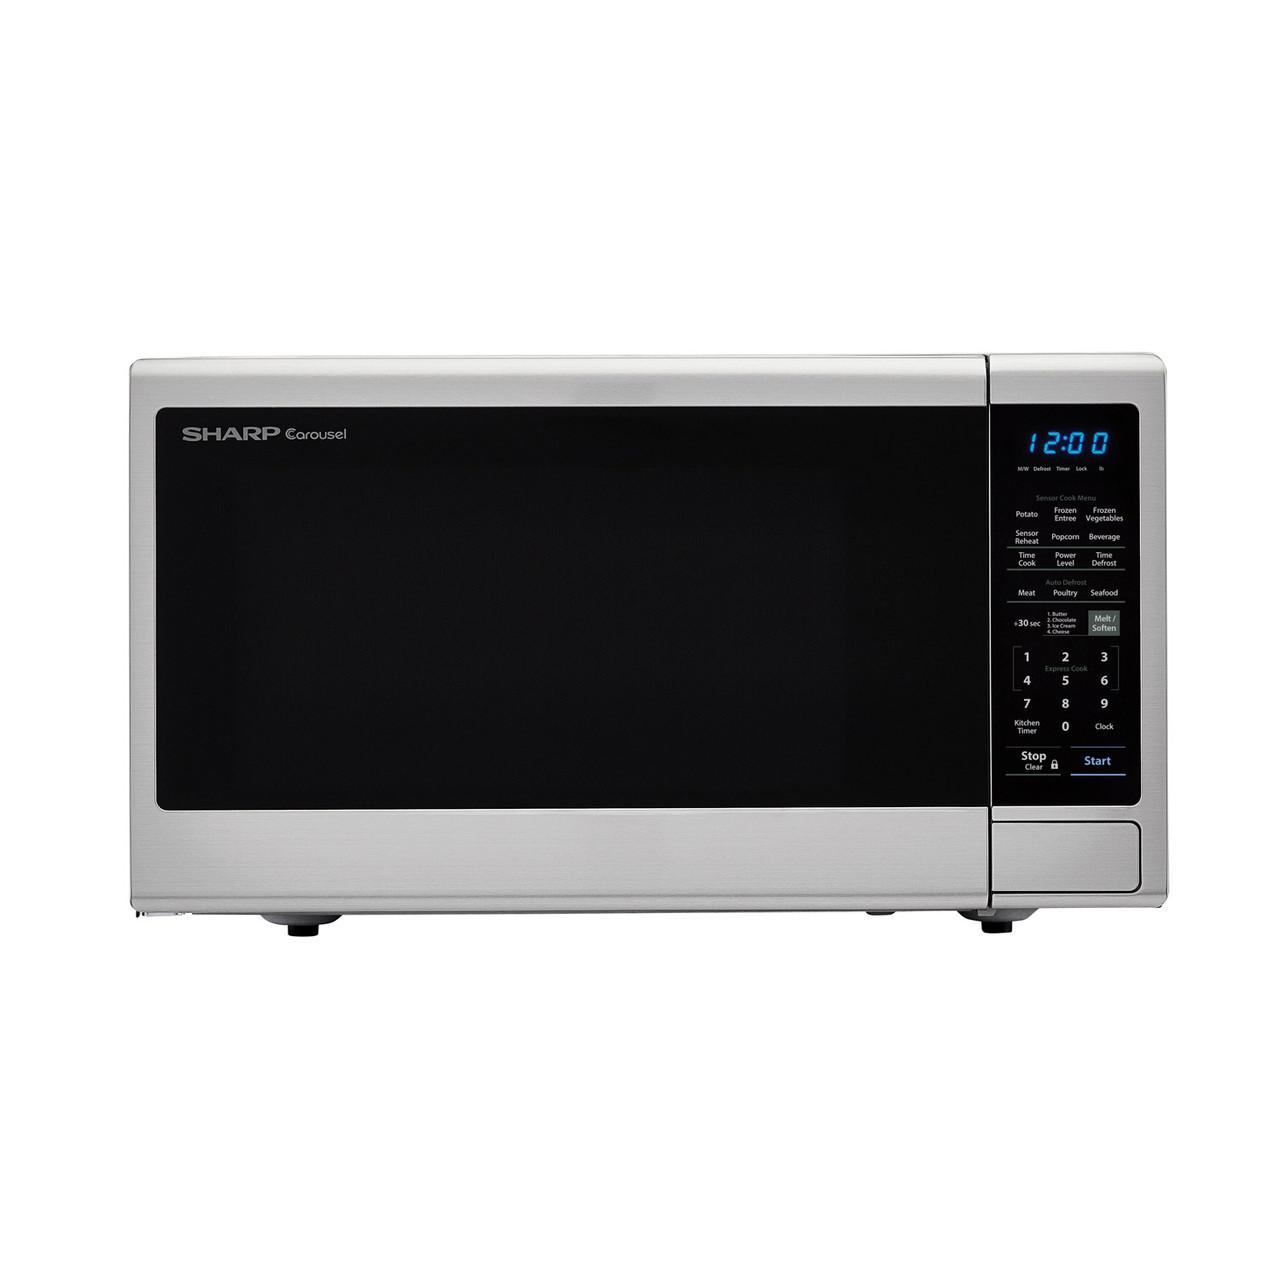 1.8 cu. ft. Sharp Stainless Steel Microwave with Black Mirror Door (SMC1843CM)